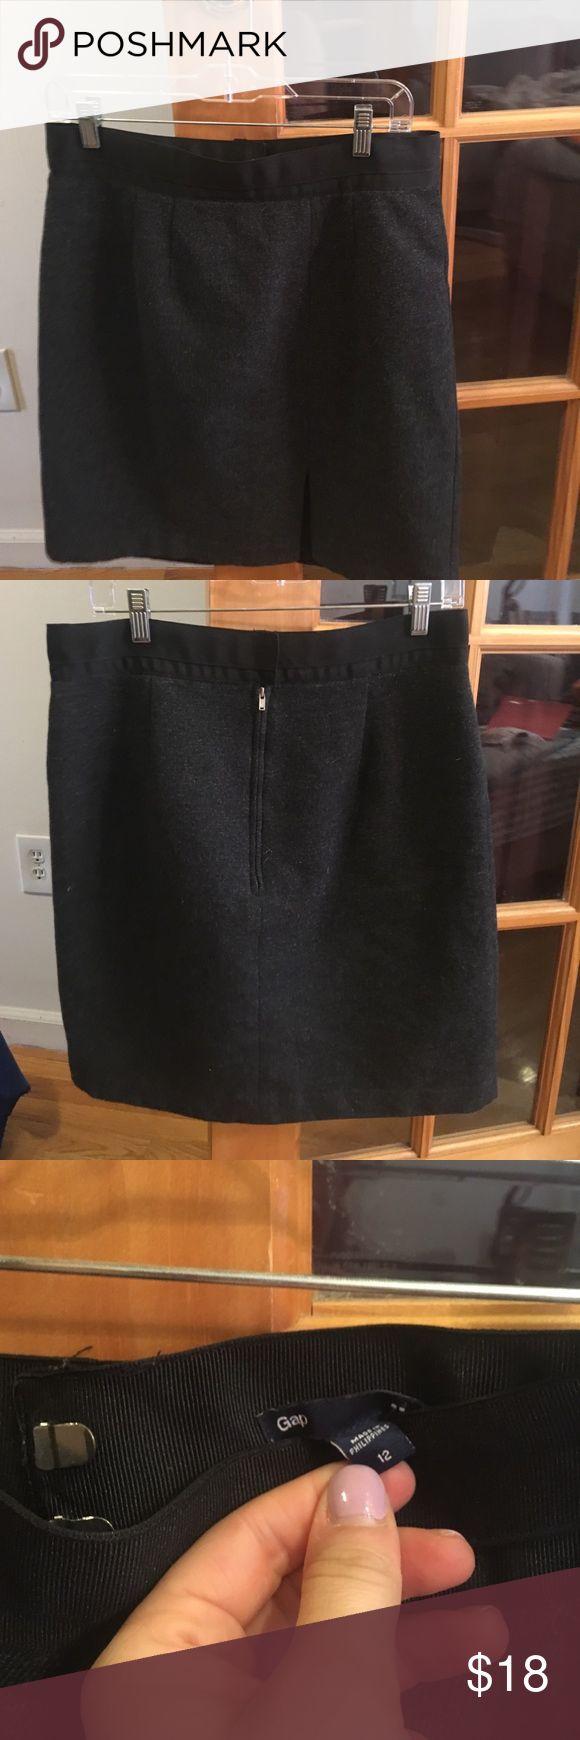 Selling this Gap Wool blend skirt sz 12 on Poshmark! My username is: msull15. #shopmycloset #poshmark #fashion #shopping #style #forsale #GAP #Dresses & Skirts